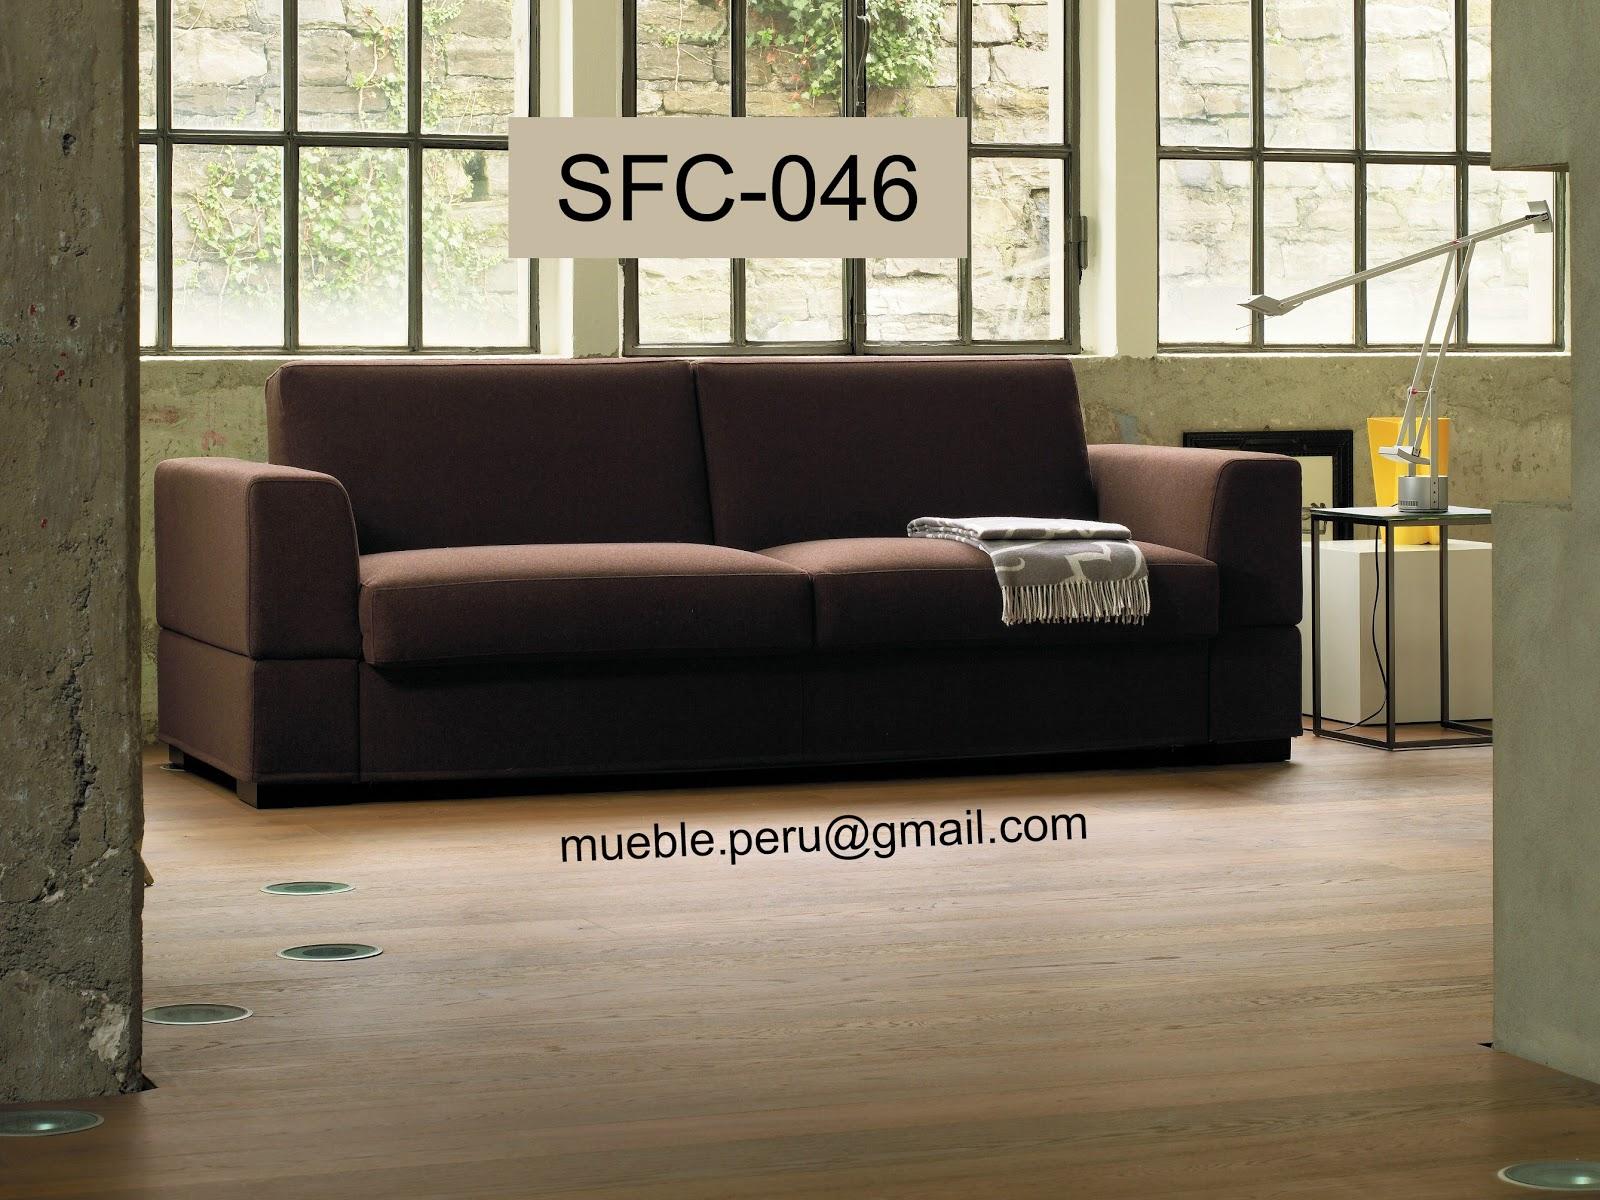 Mueble Per Muebles De Sala Sofas Cama Modernos